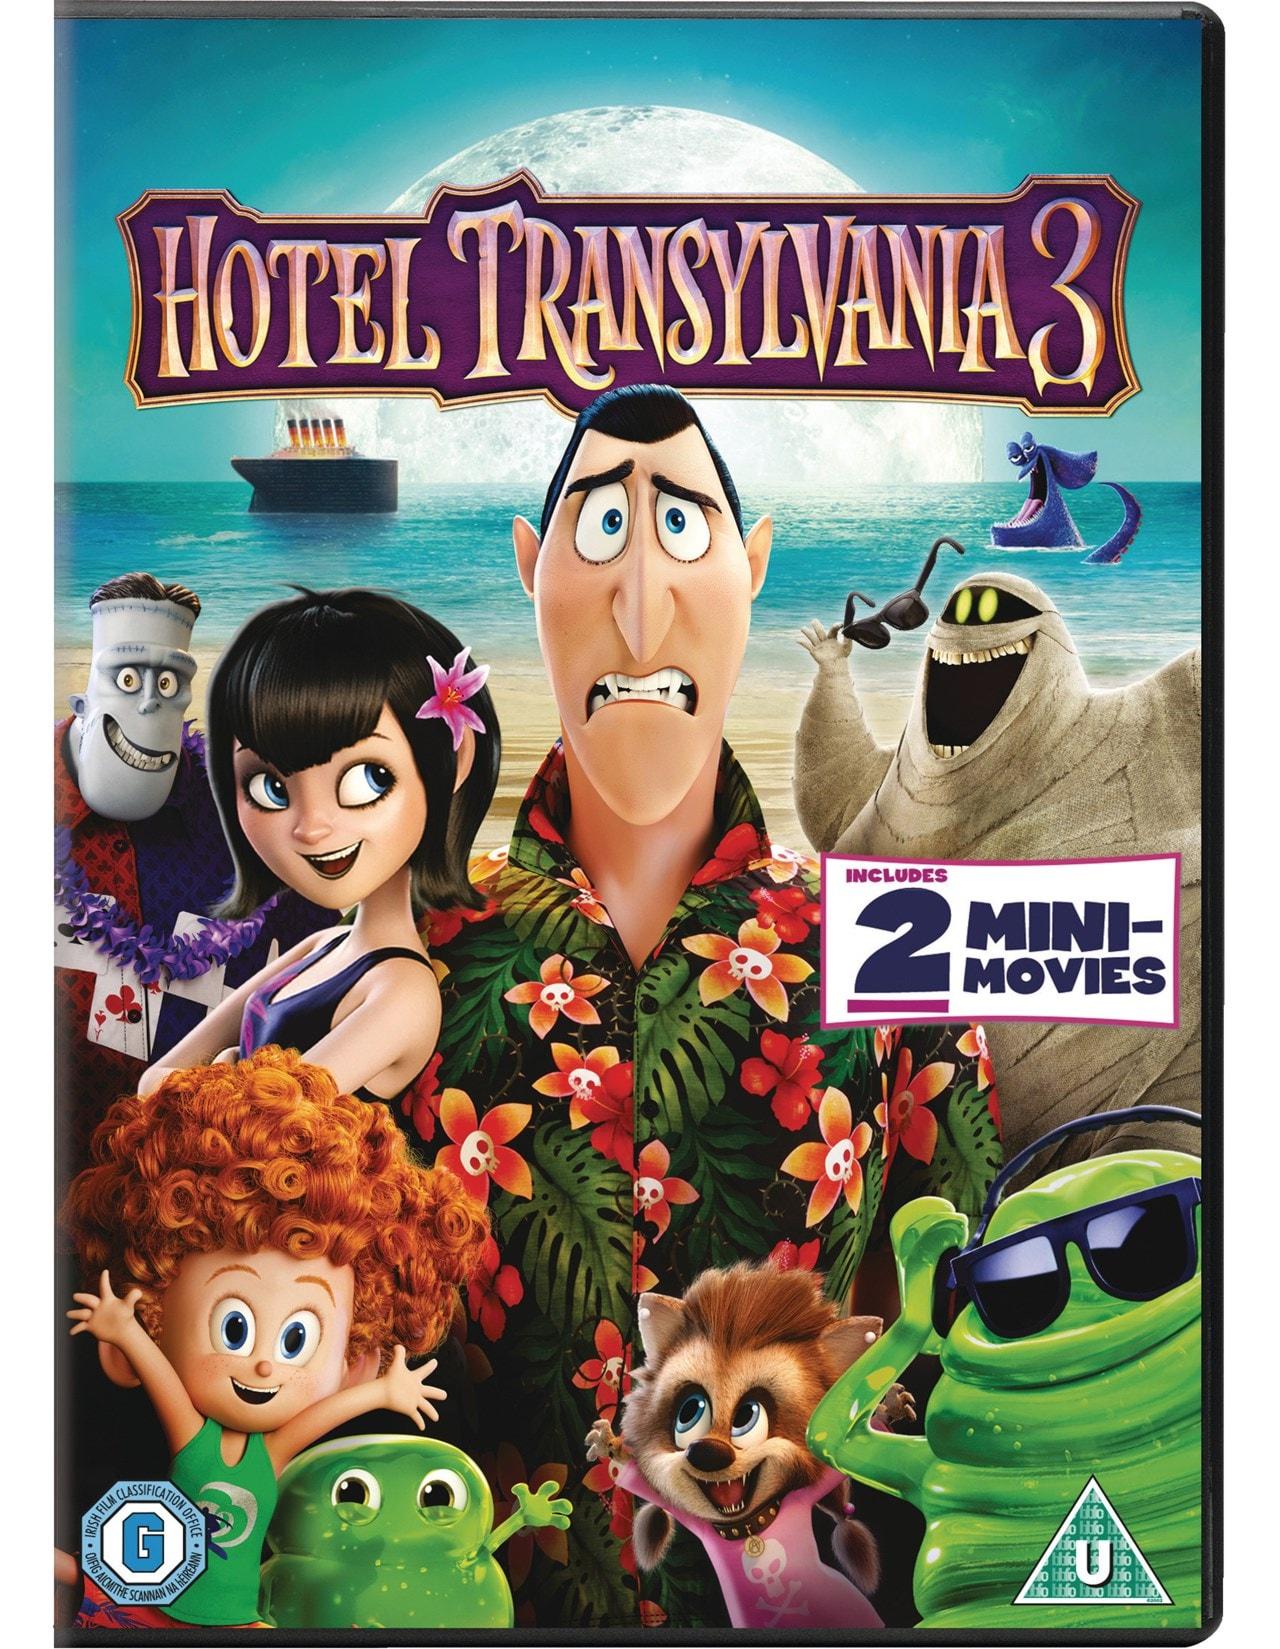 Hotel Transylvania 3 Dvd Free Shipping Over 20 Hmv Store